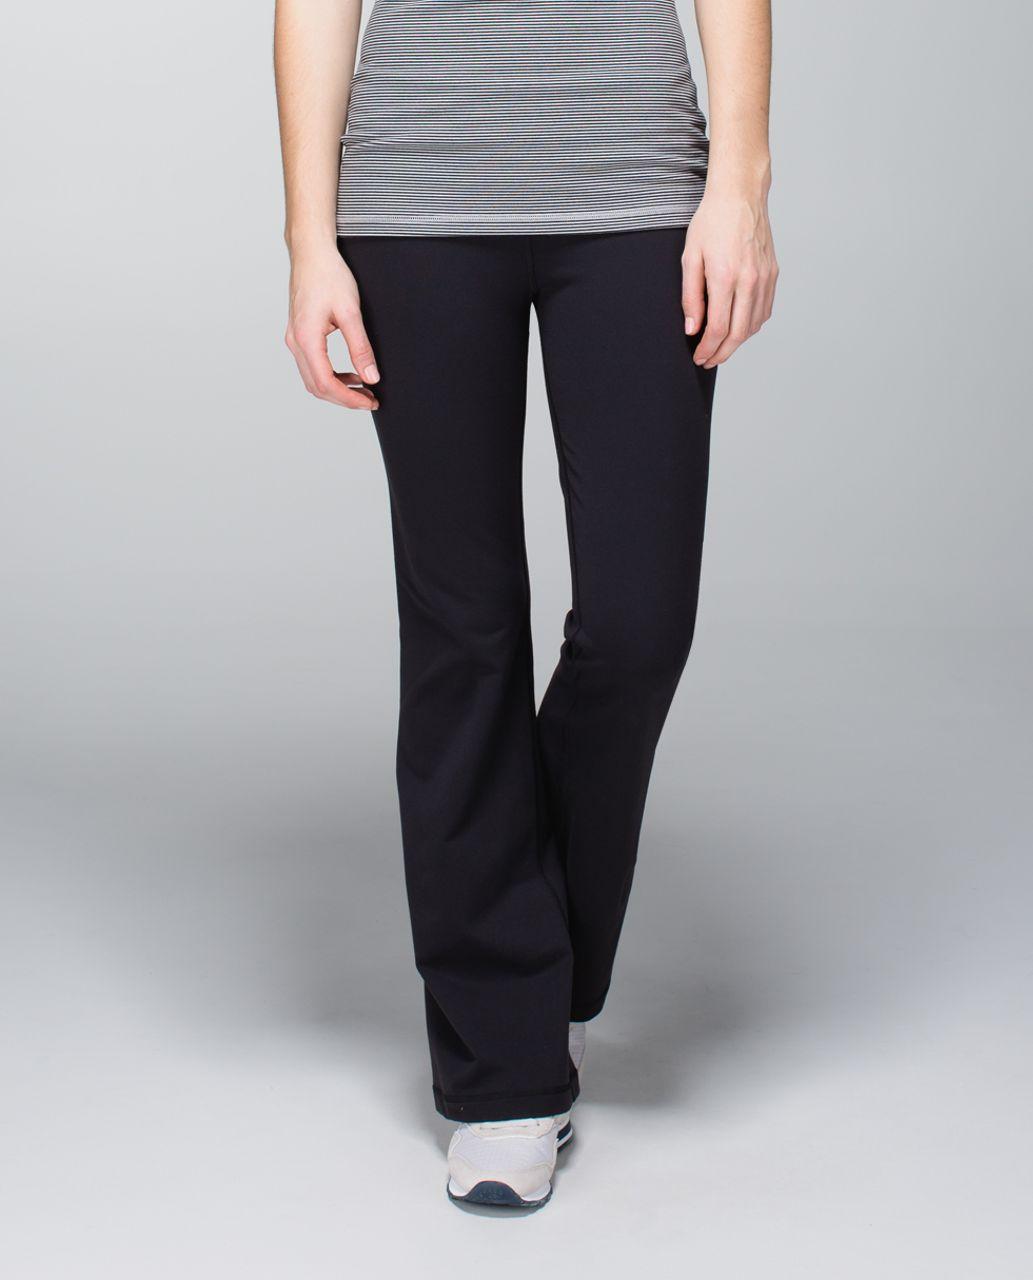 Lululemon Groove Pant (Regular) *Full-On Luon - Black